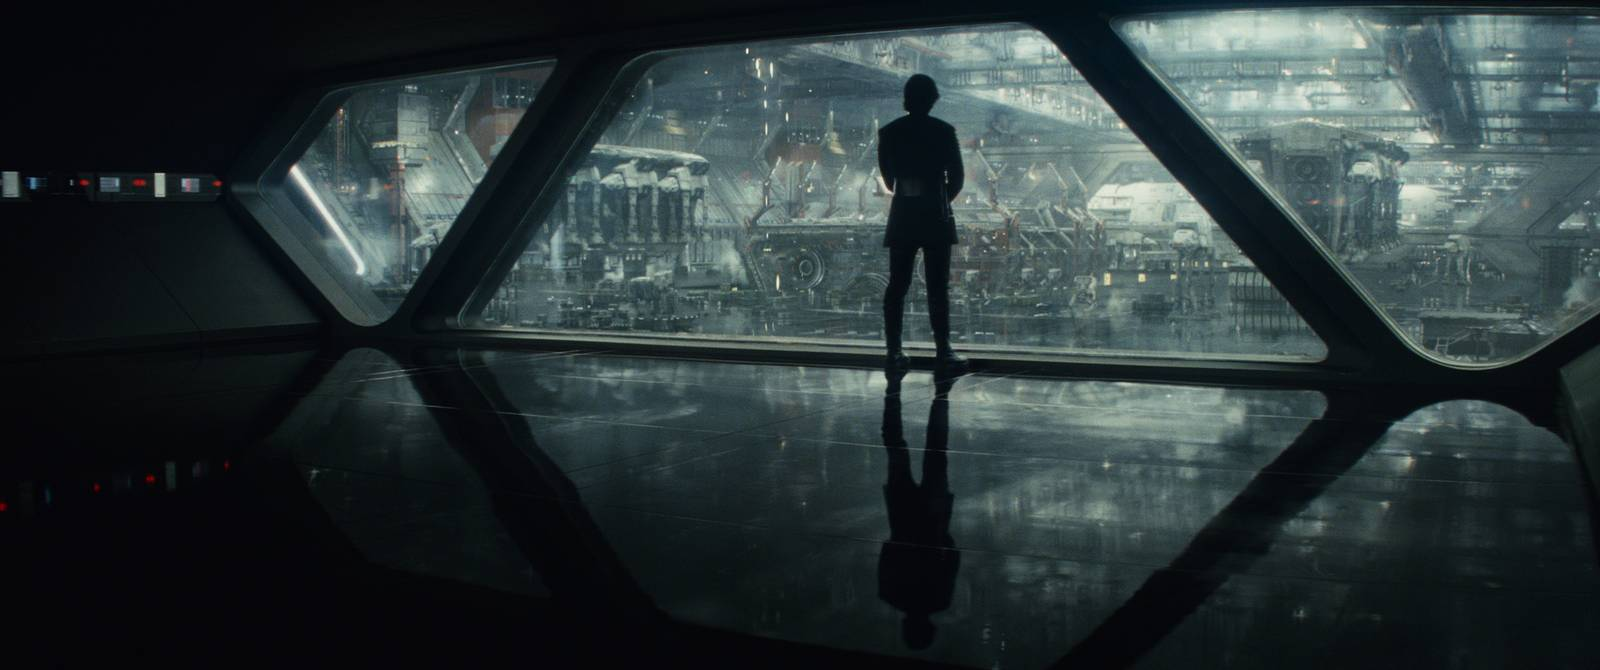 Fotogaléria Star Wars: Poslední Jediovia (2017)